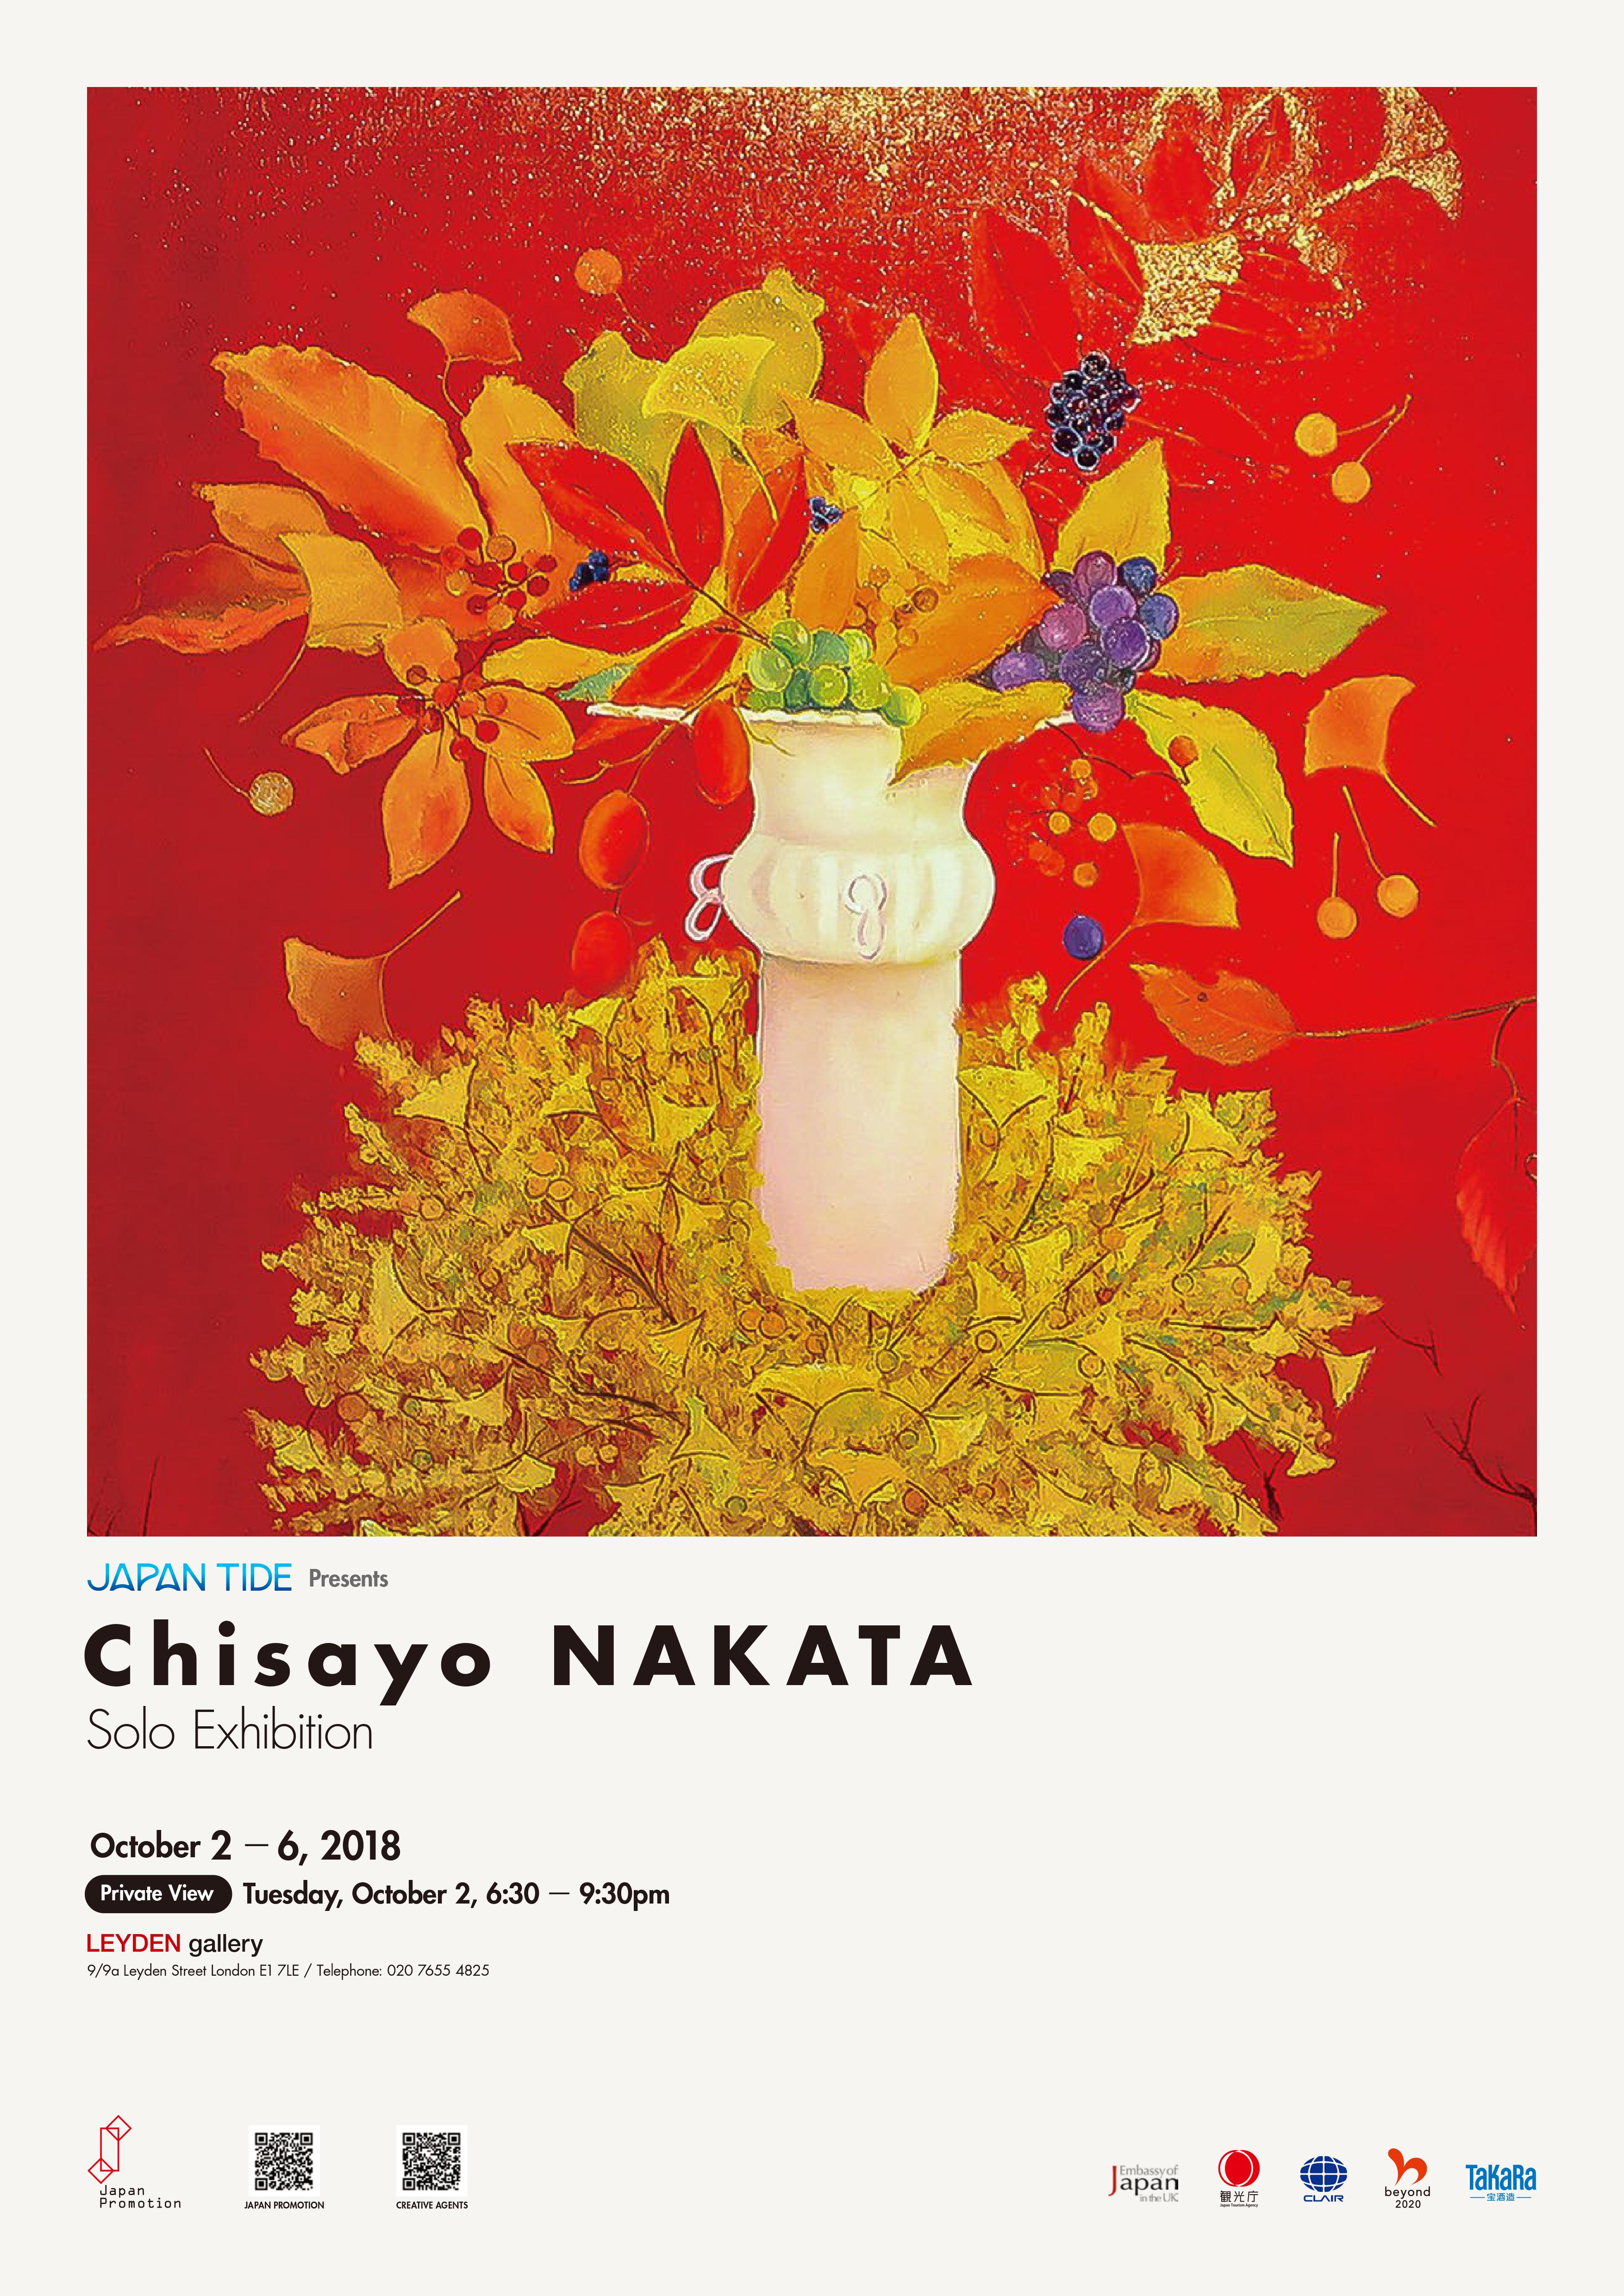 Japan Tide presents Chisayo Nakata Exhibition